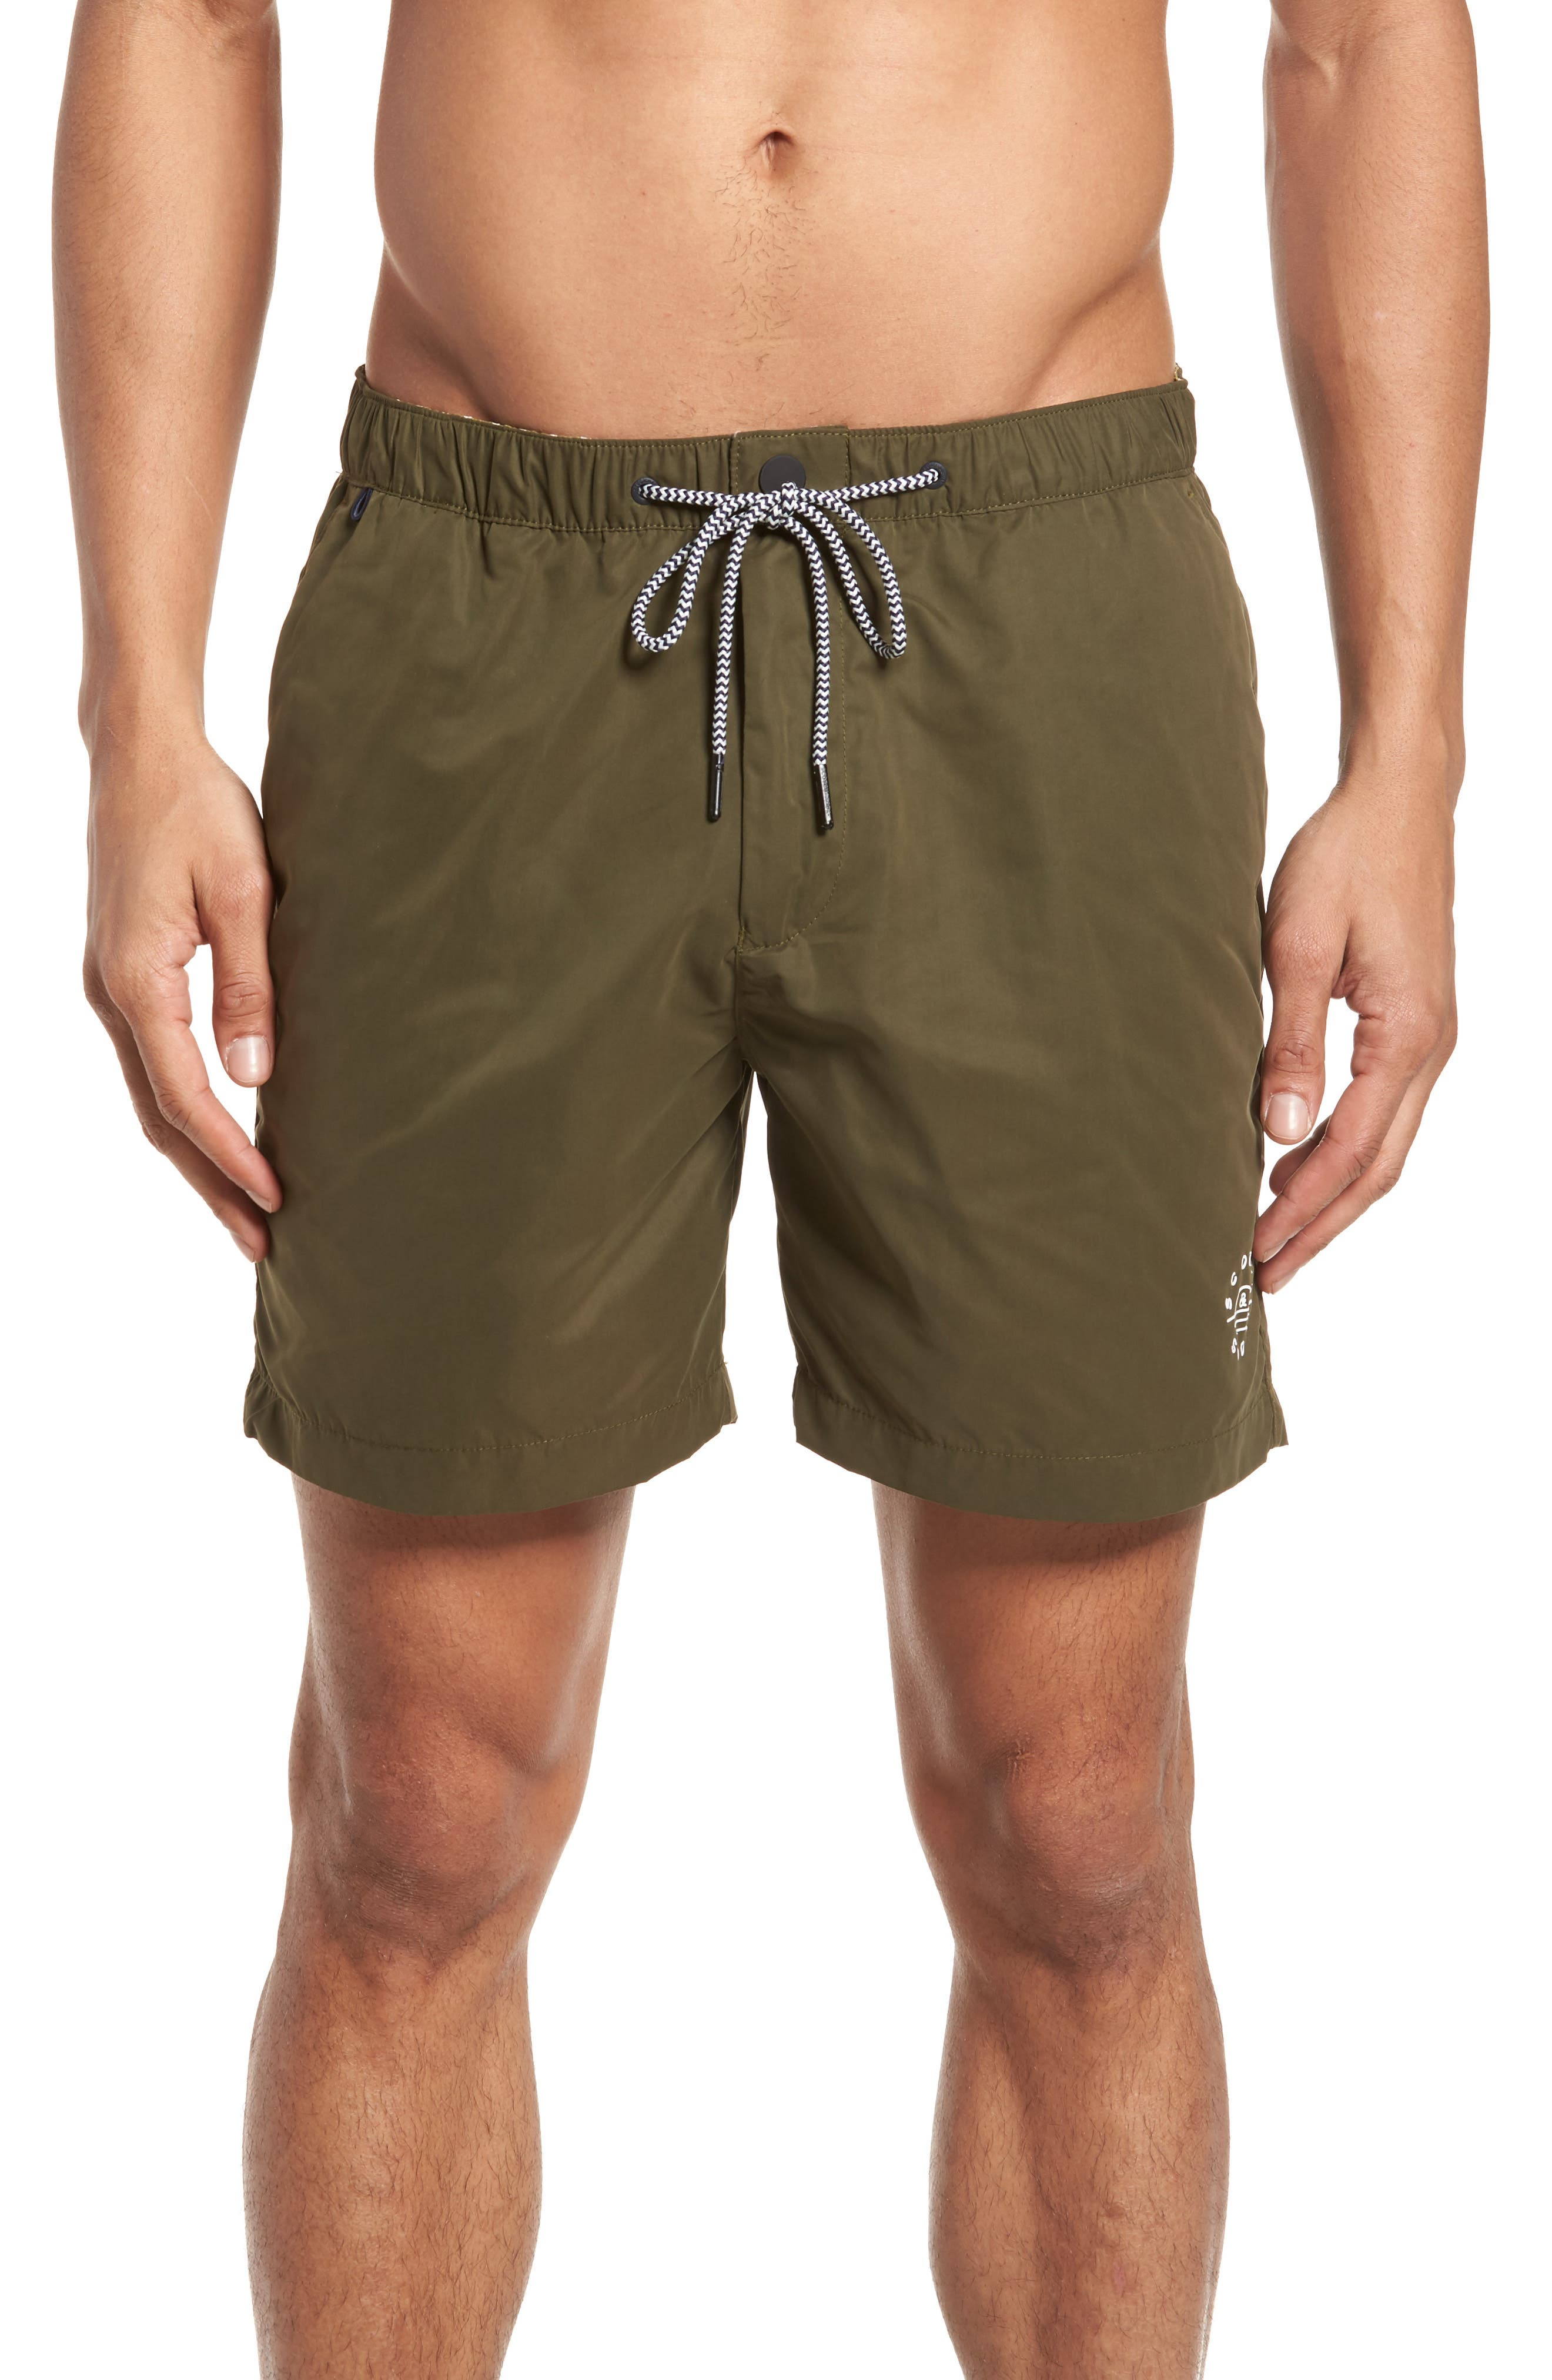 Swim Trunks,                         Main,                         color, Military